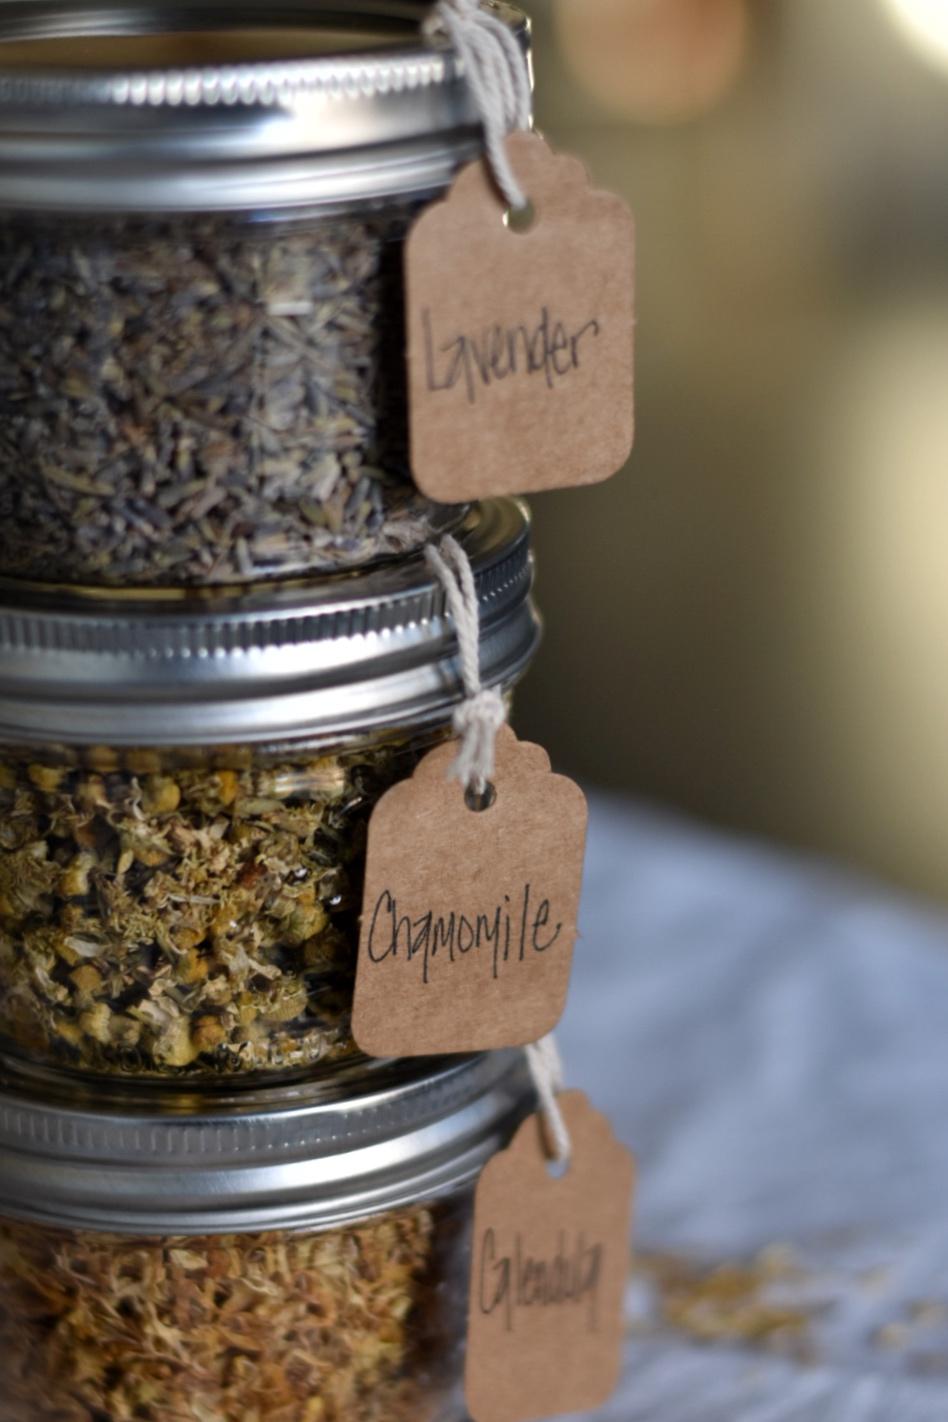 Diy Mason Jar Spice and Herb Organization with Labels | Rocky Hedge Farm